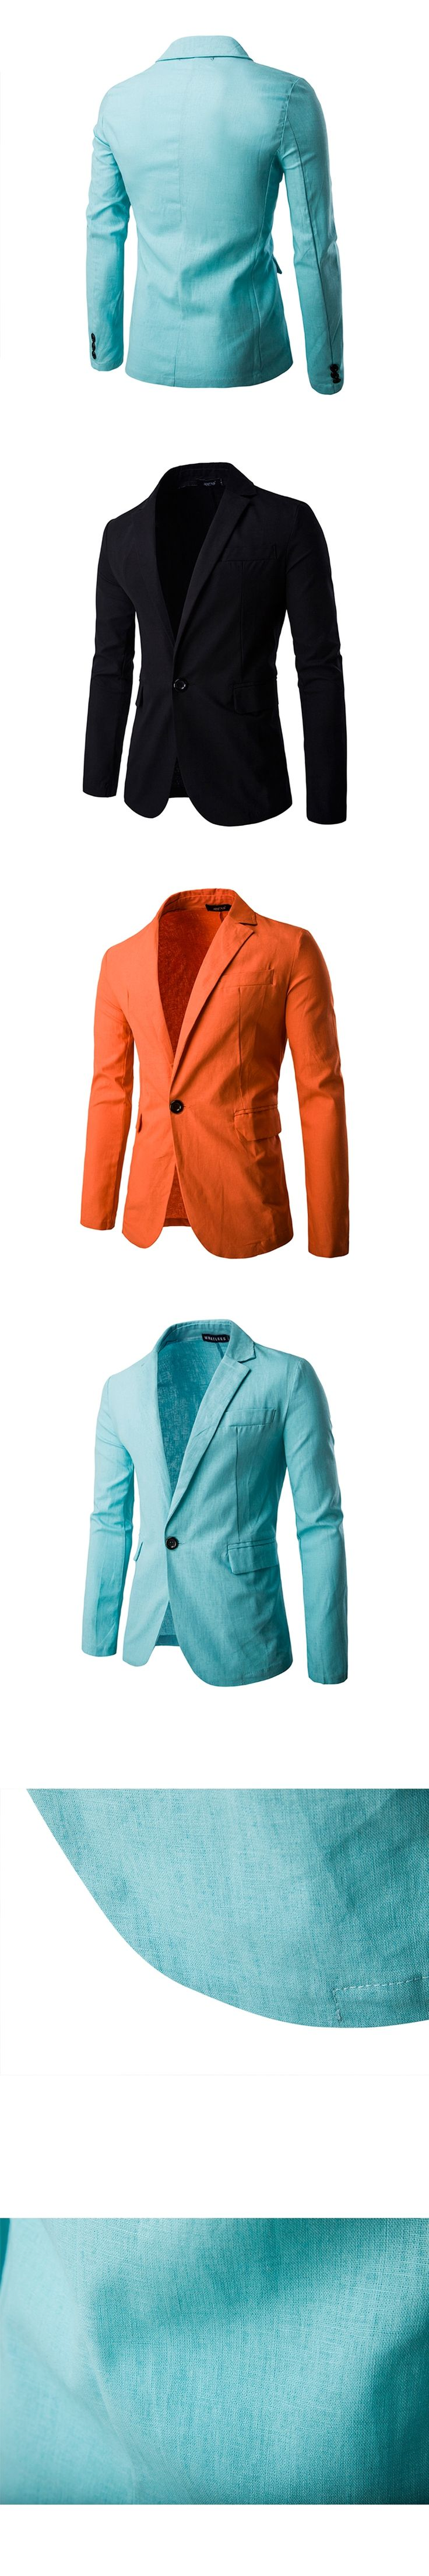 2016 HOT Casual Slim fit  Stylish Single Botton Suit Blazer Mens Coat Male Fashion  Formal Clothing Long  Sleeve PX24